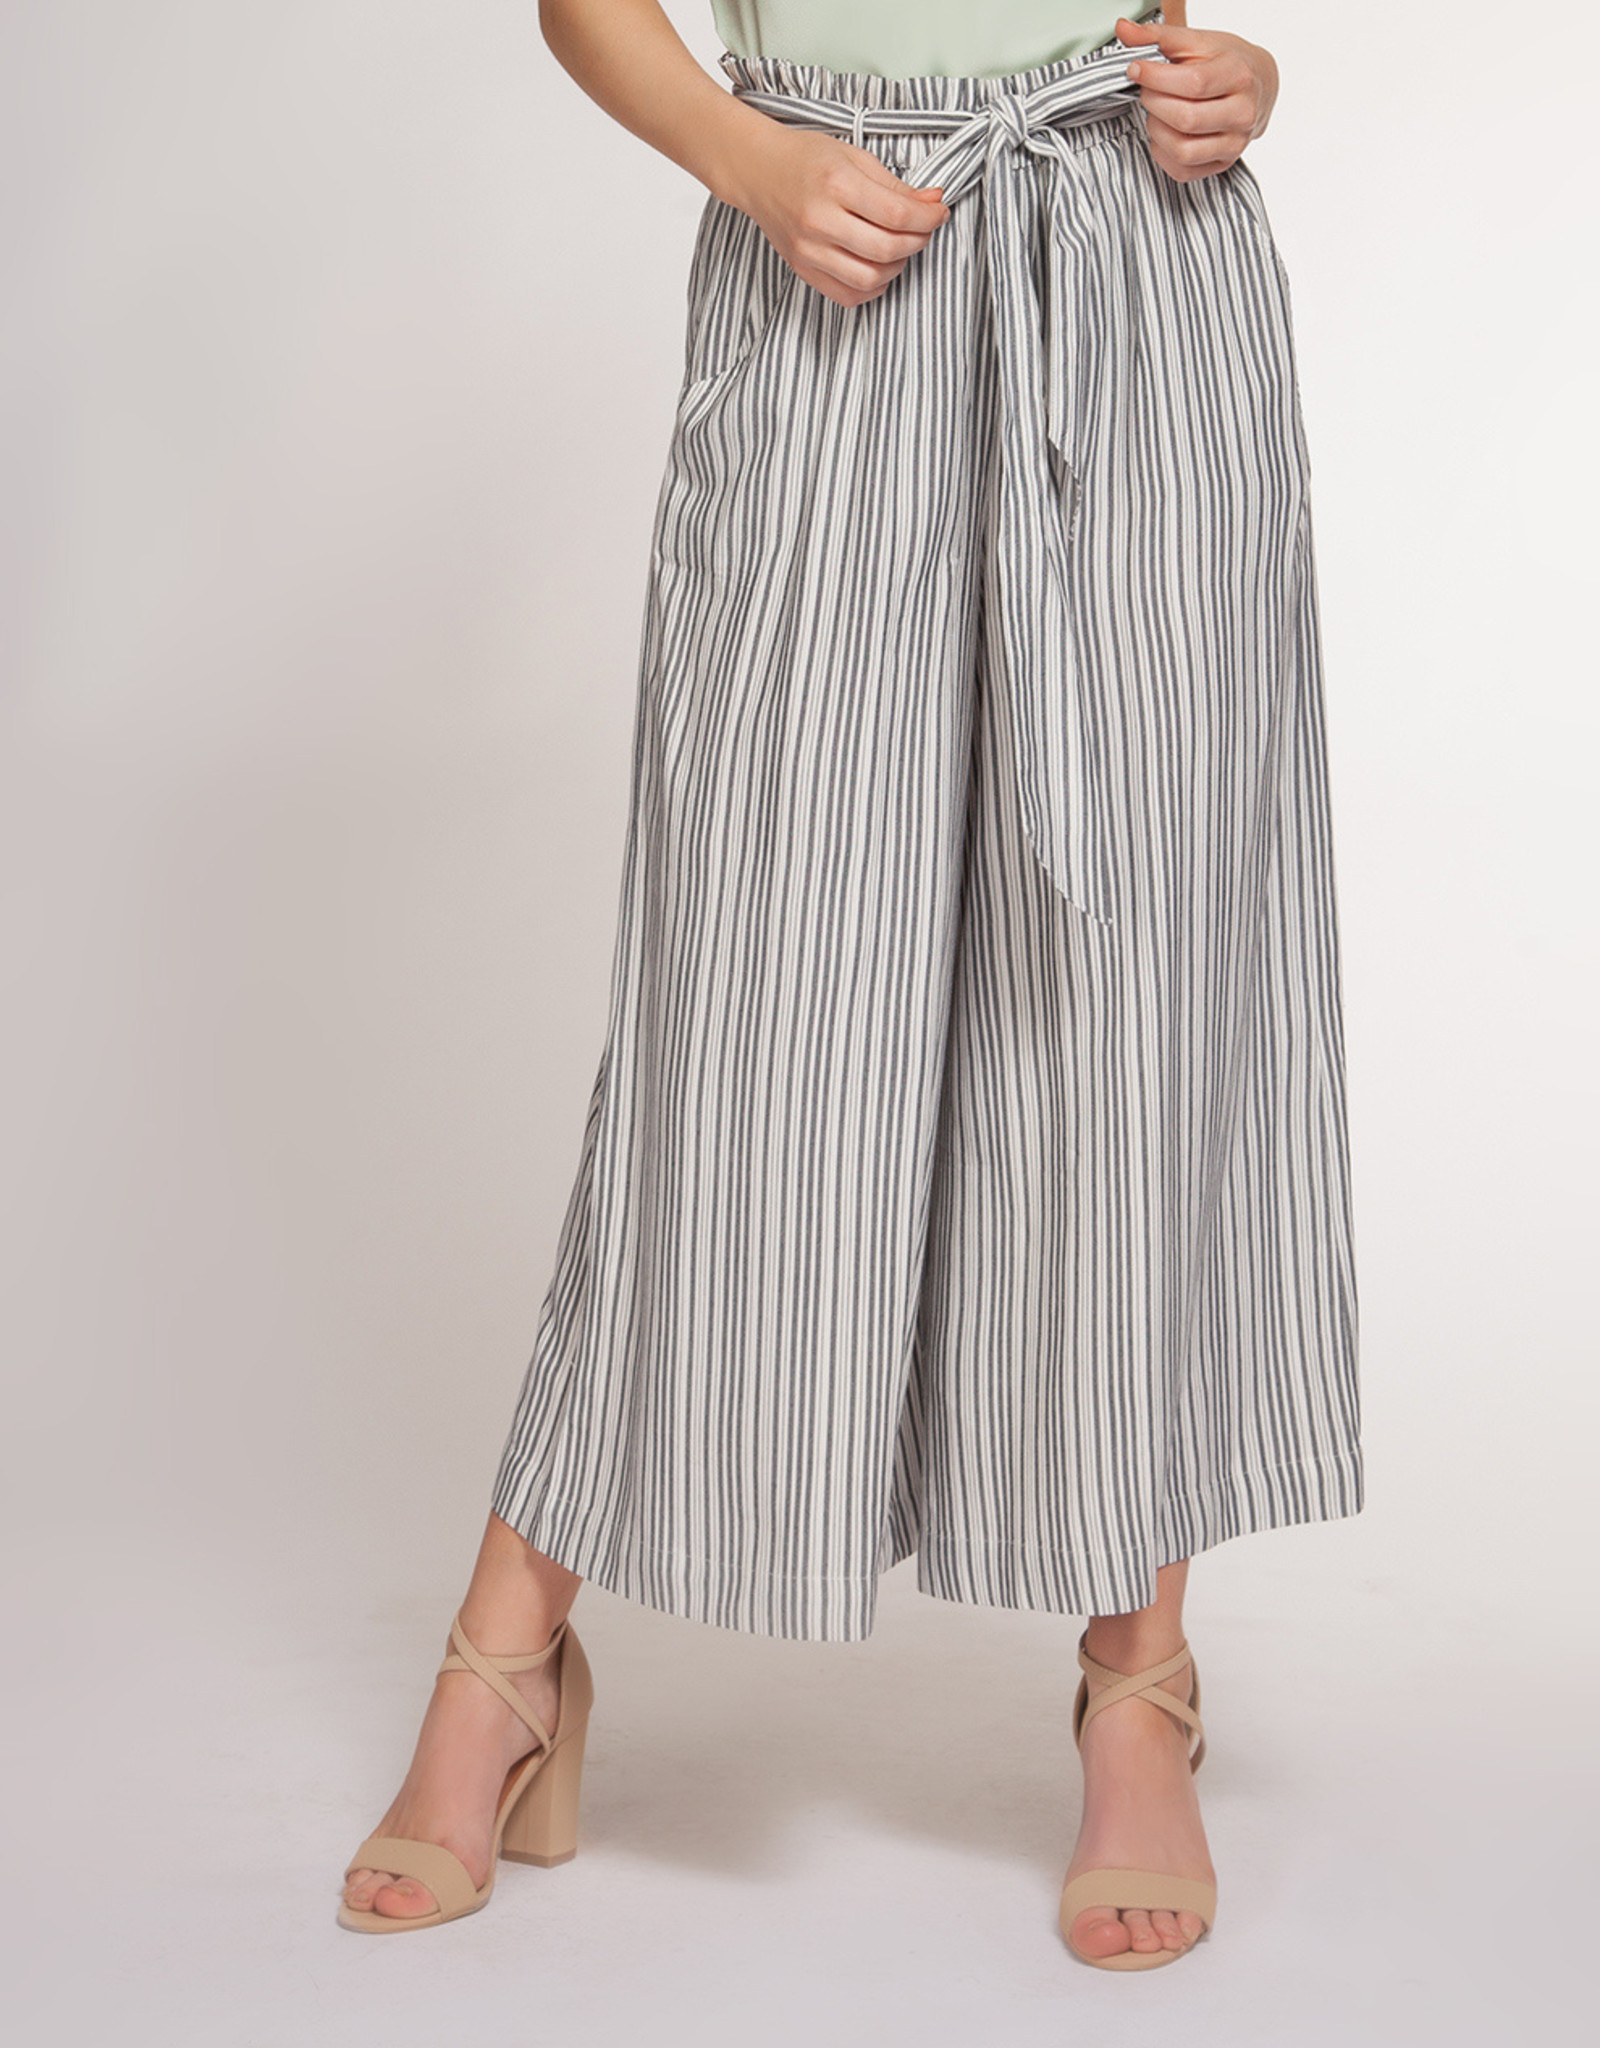 Dex Distressed Black/Stripe Pants